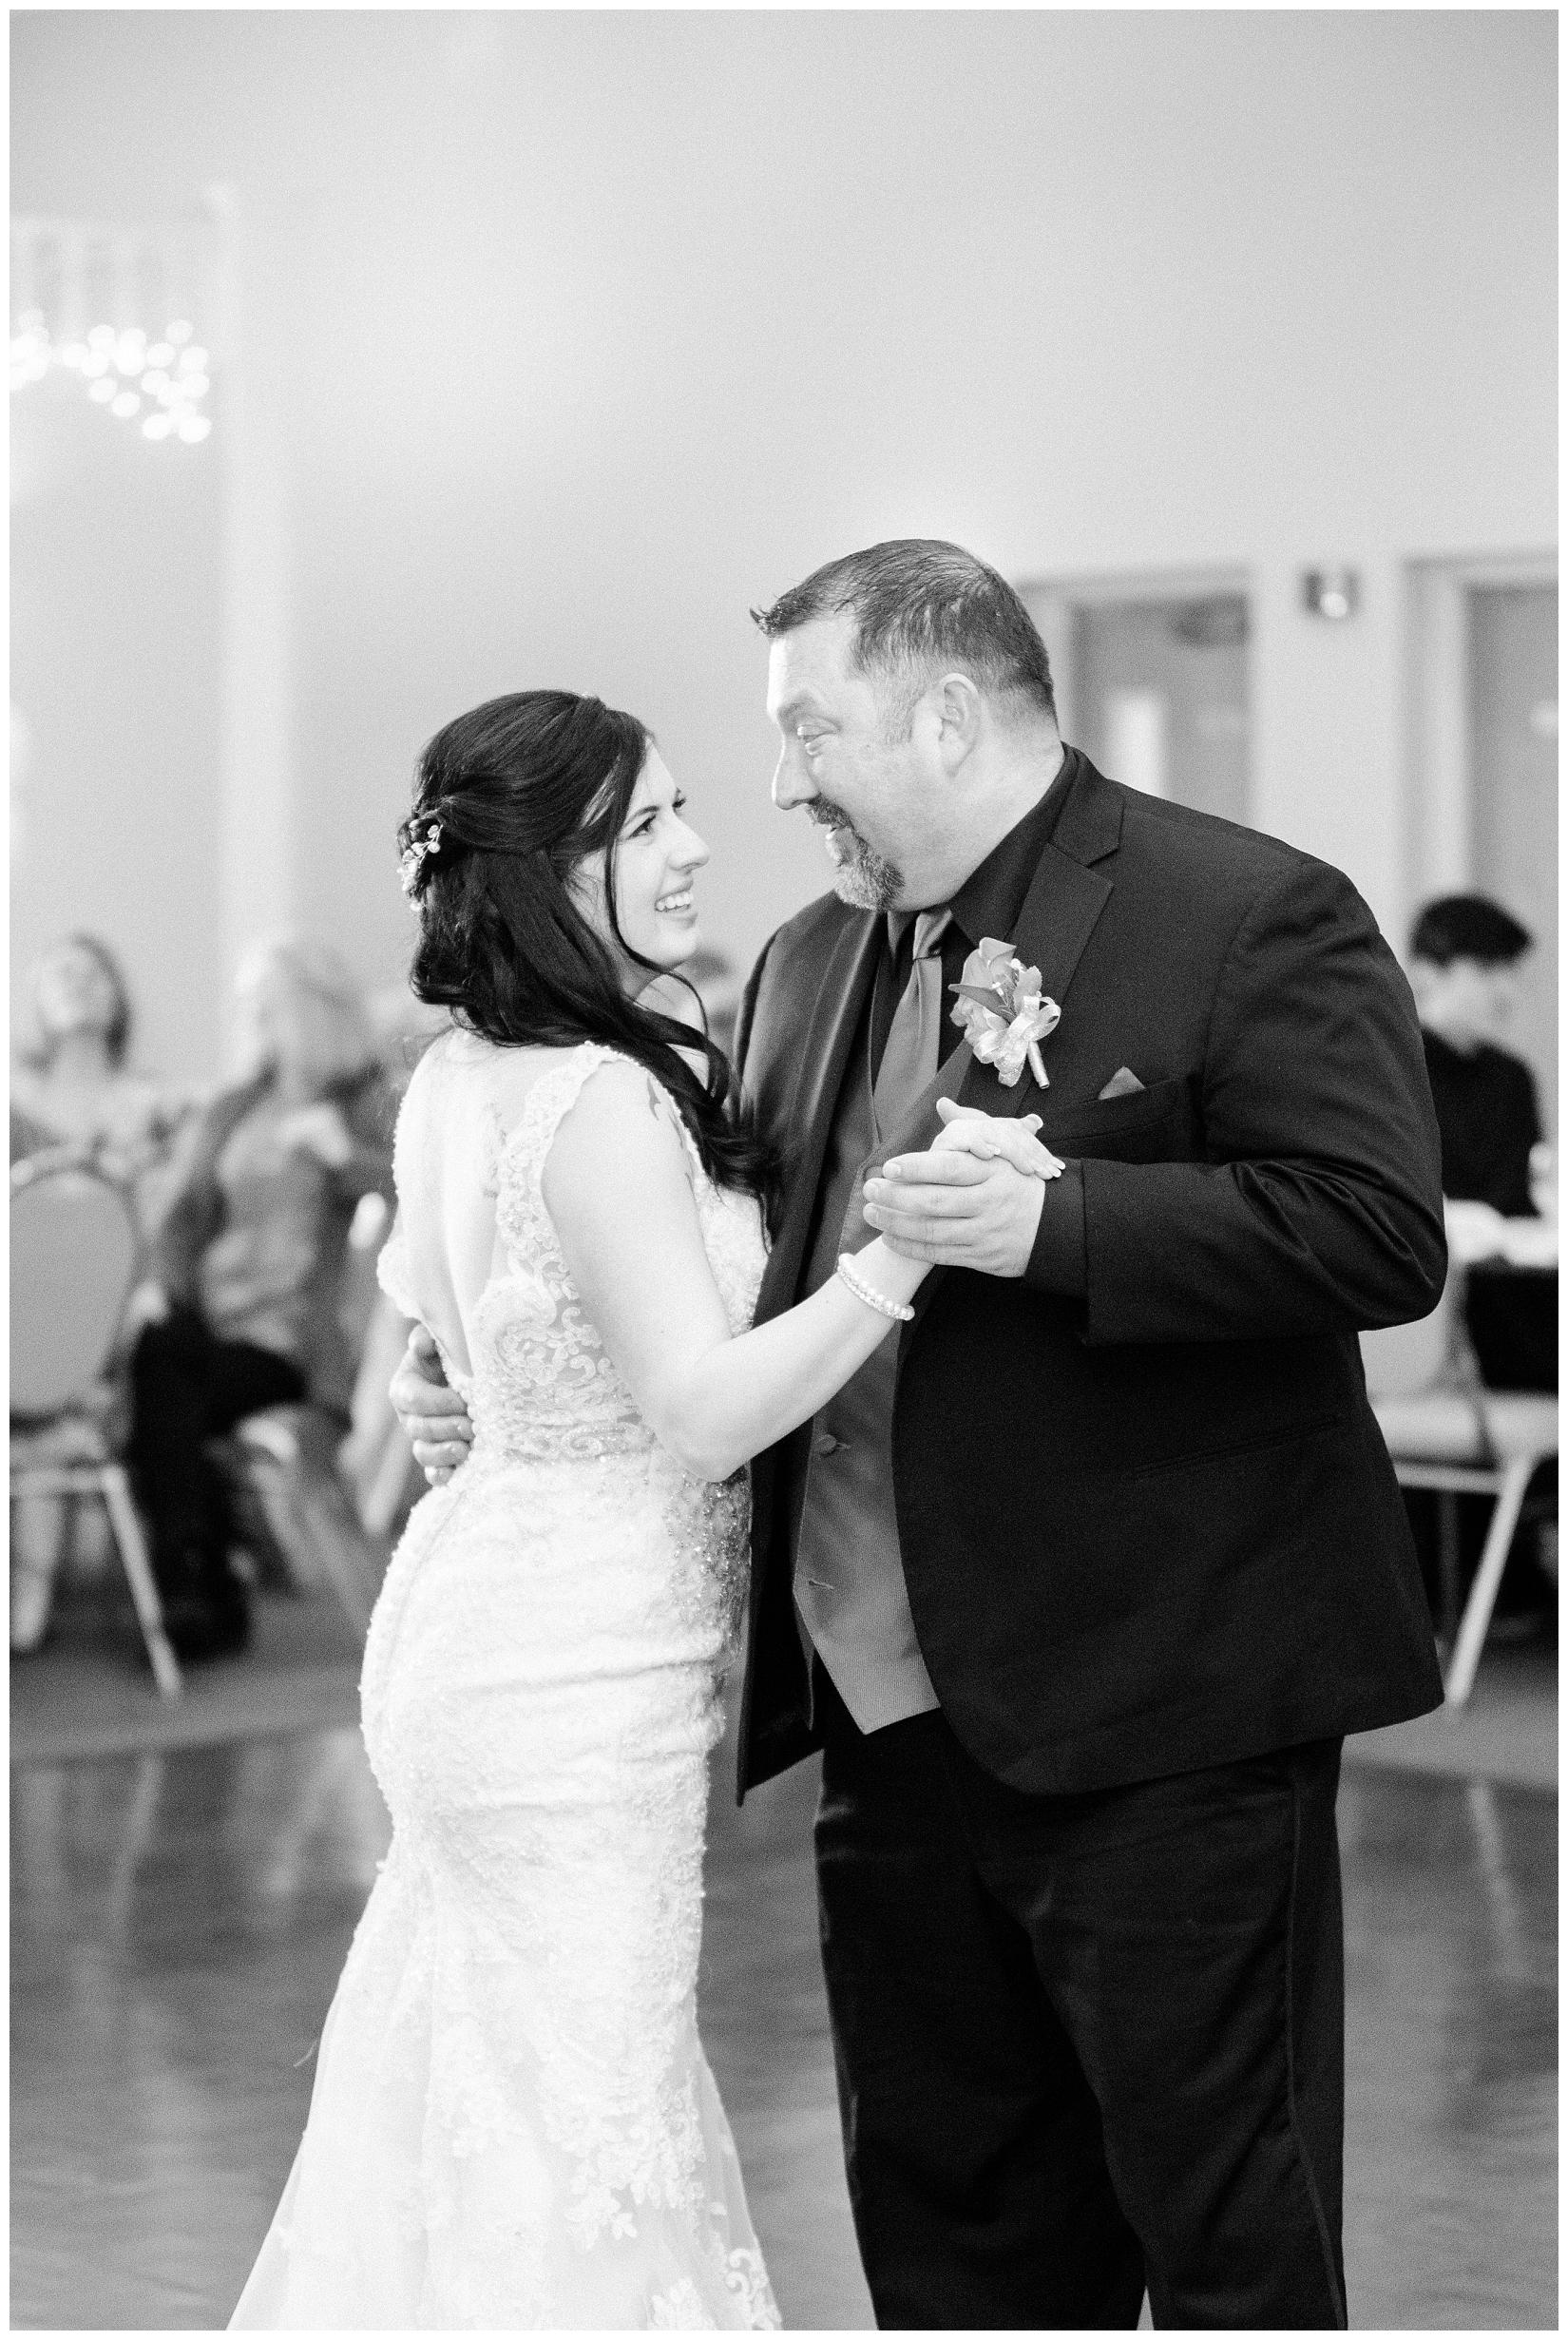 cat-alkire-wedding-photographer-indiana-chicago-indianapolis-fort-wayne_1122.jpg